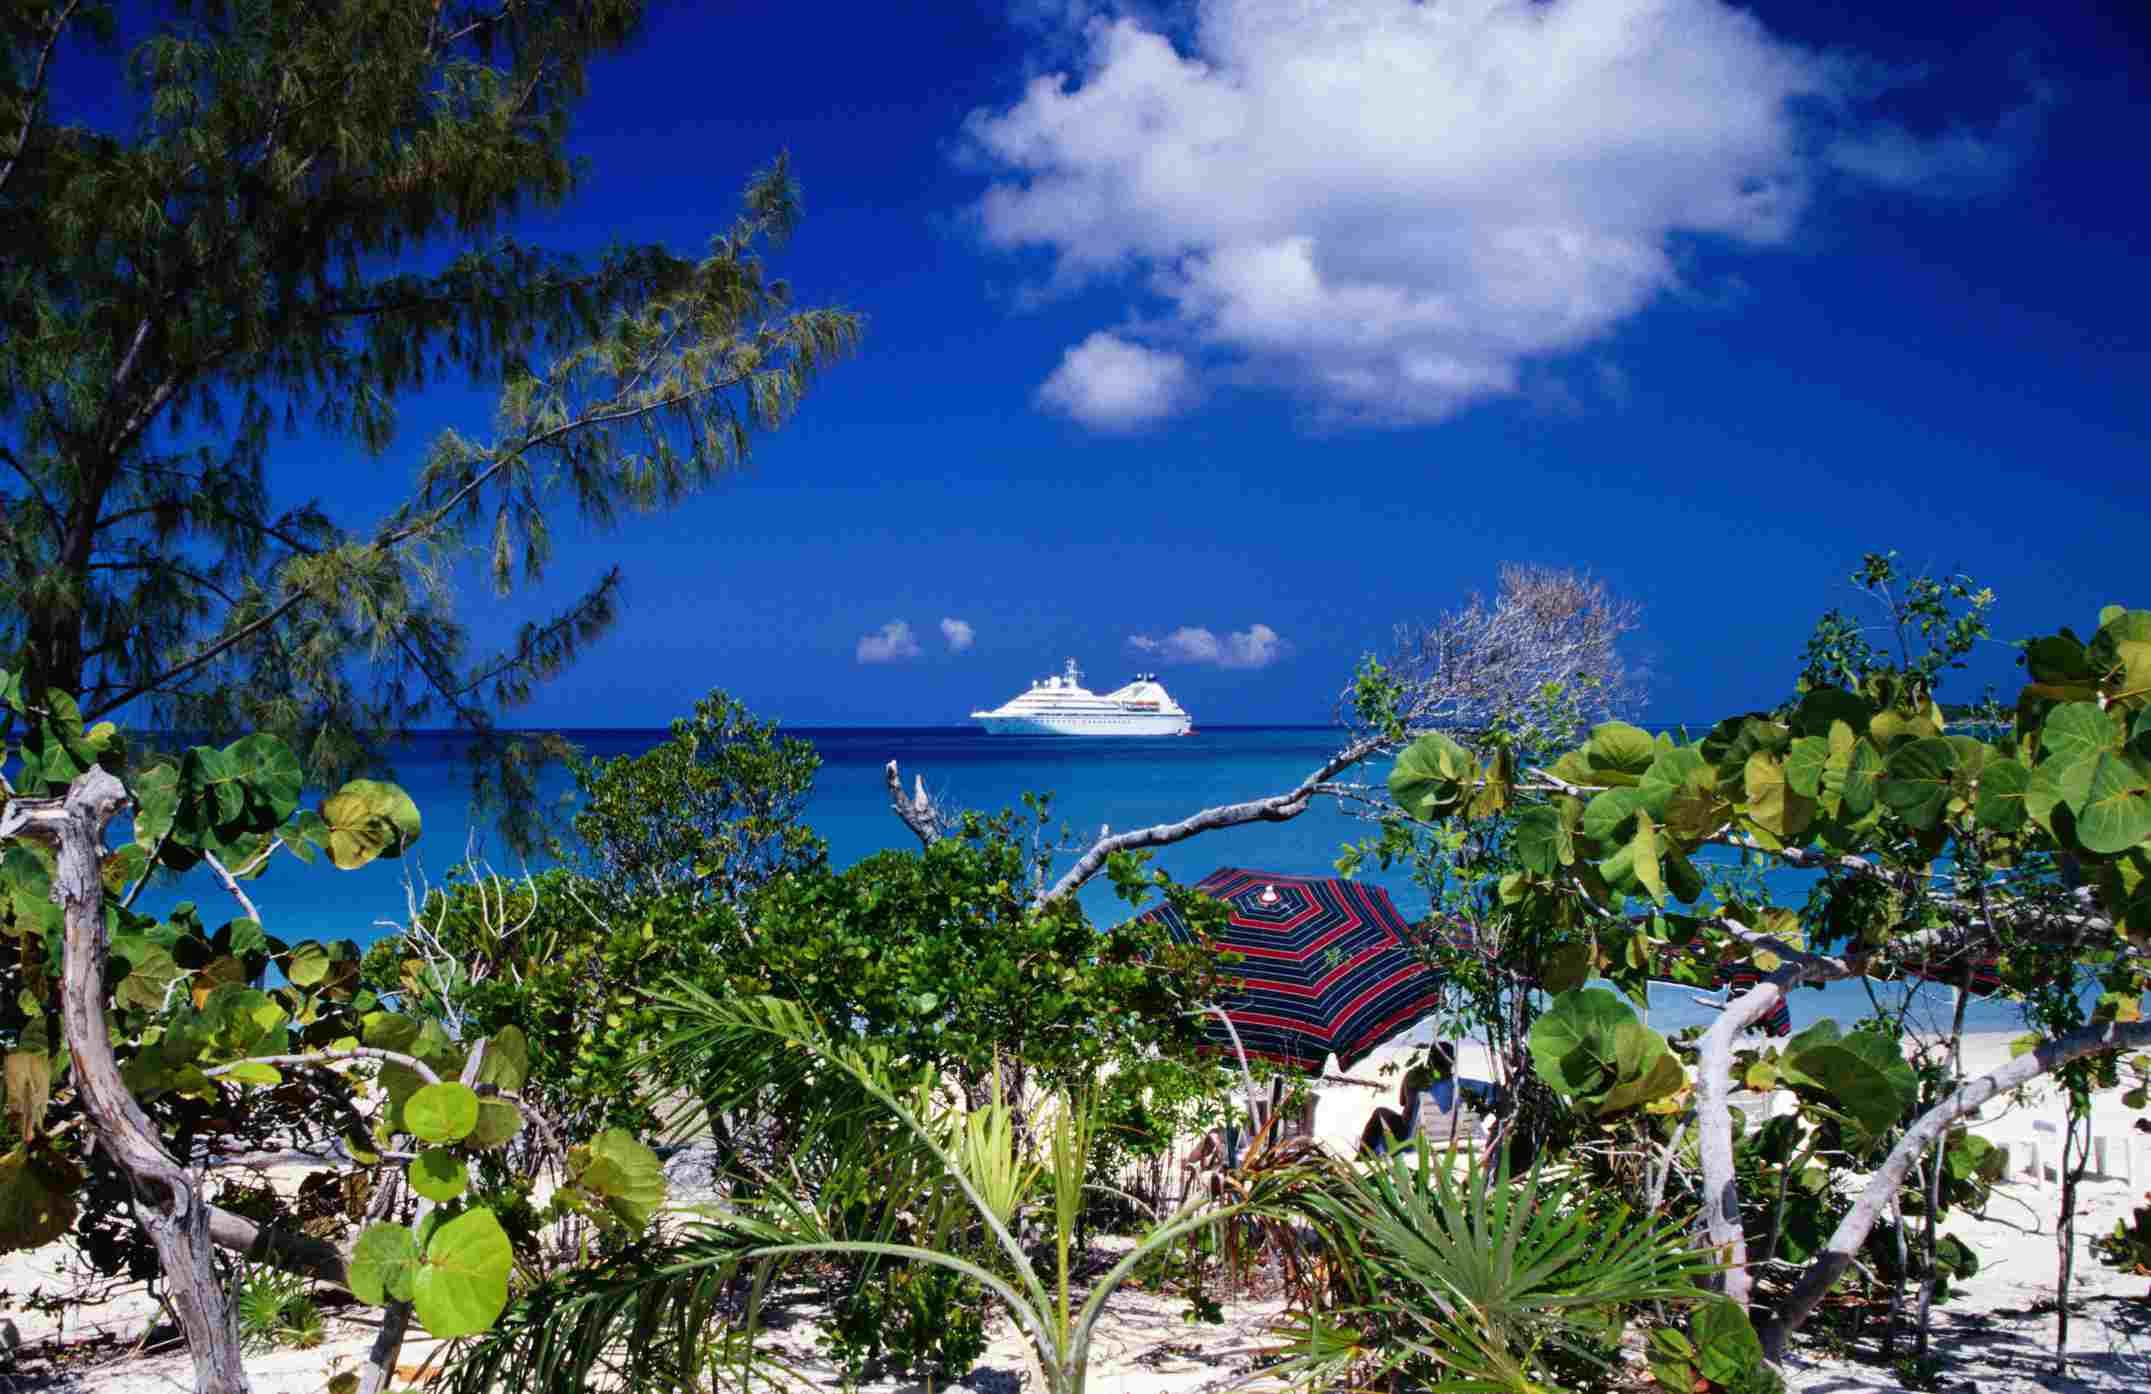 Half Moon Cay, Seabourn Pride cruise ship offshore, Bahamas